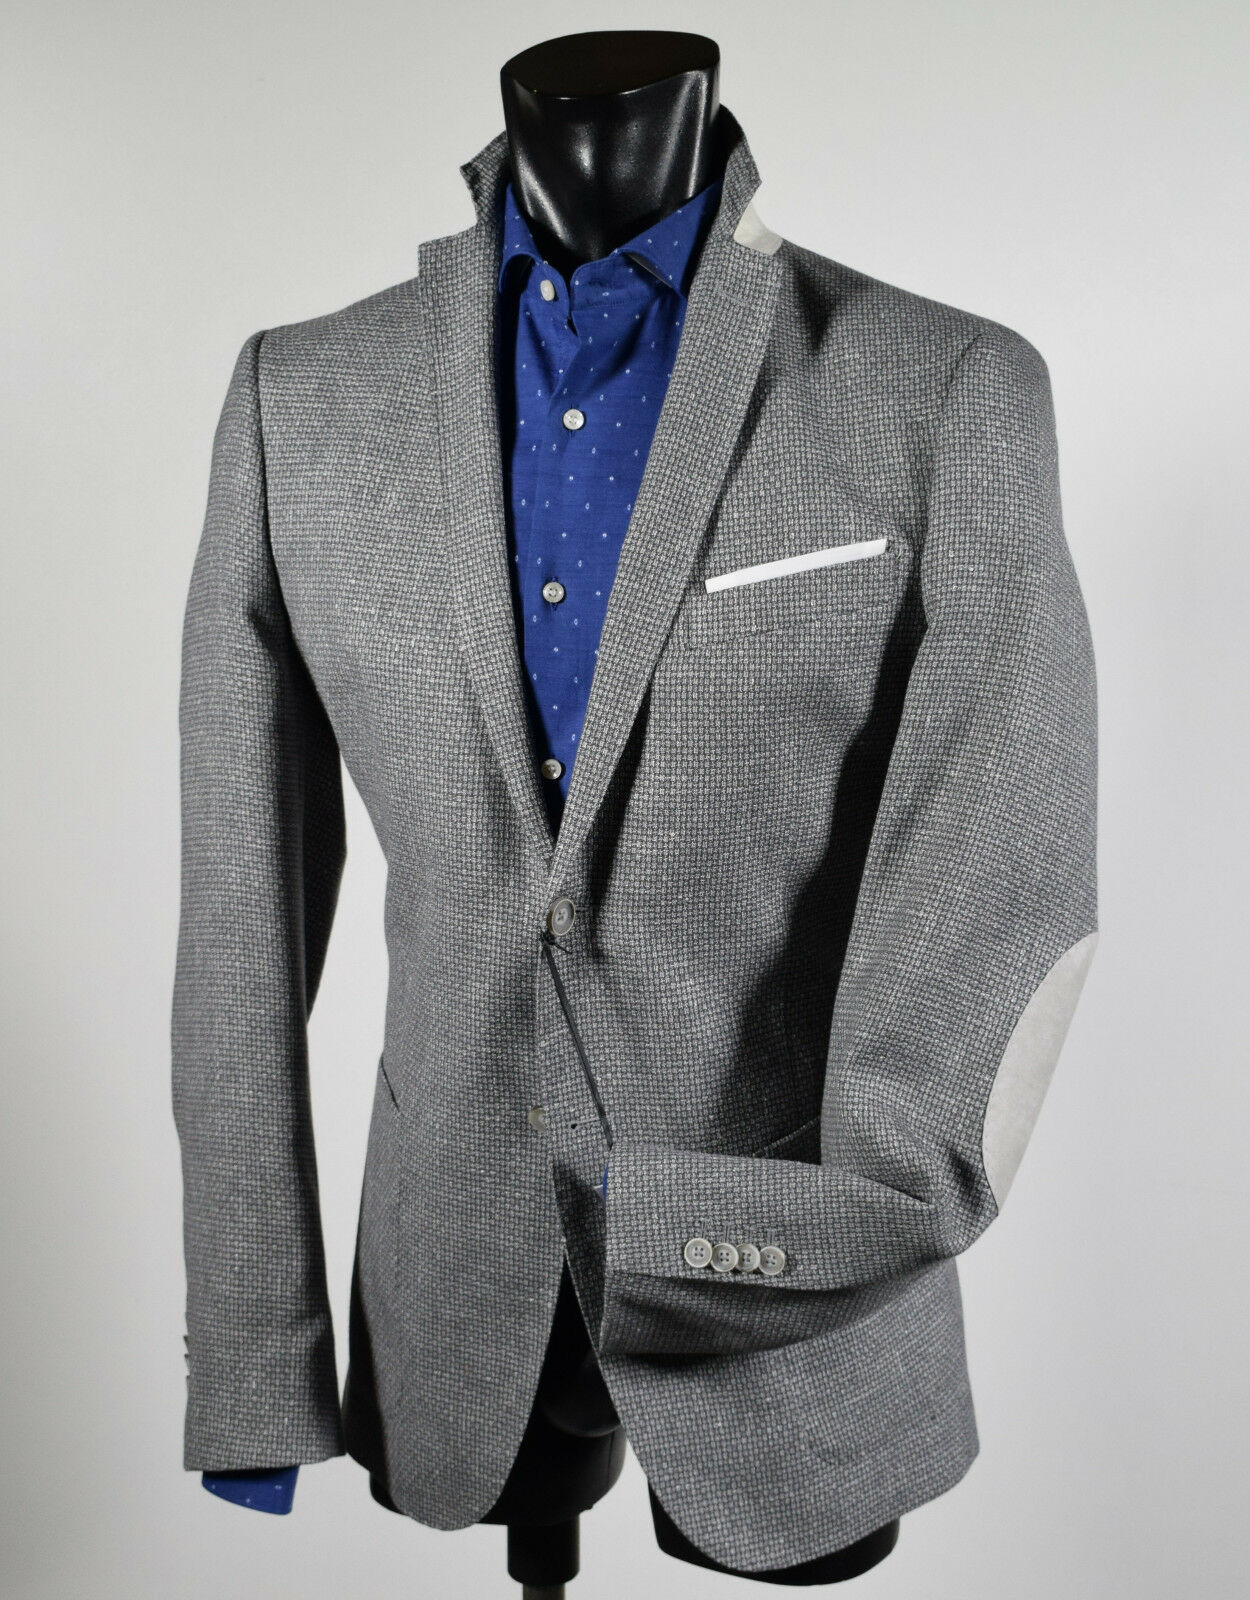 Giacca Blazer grey John Barritt con toppe Slim Fit Sfoderata Cotone e Lino